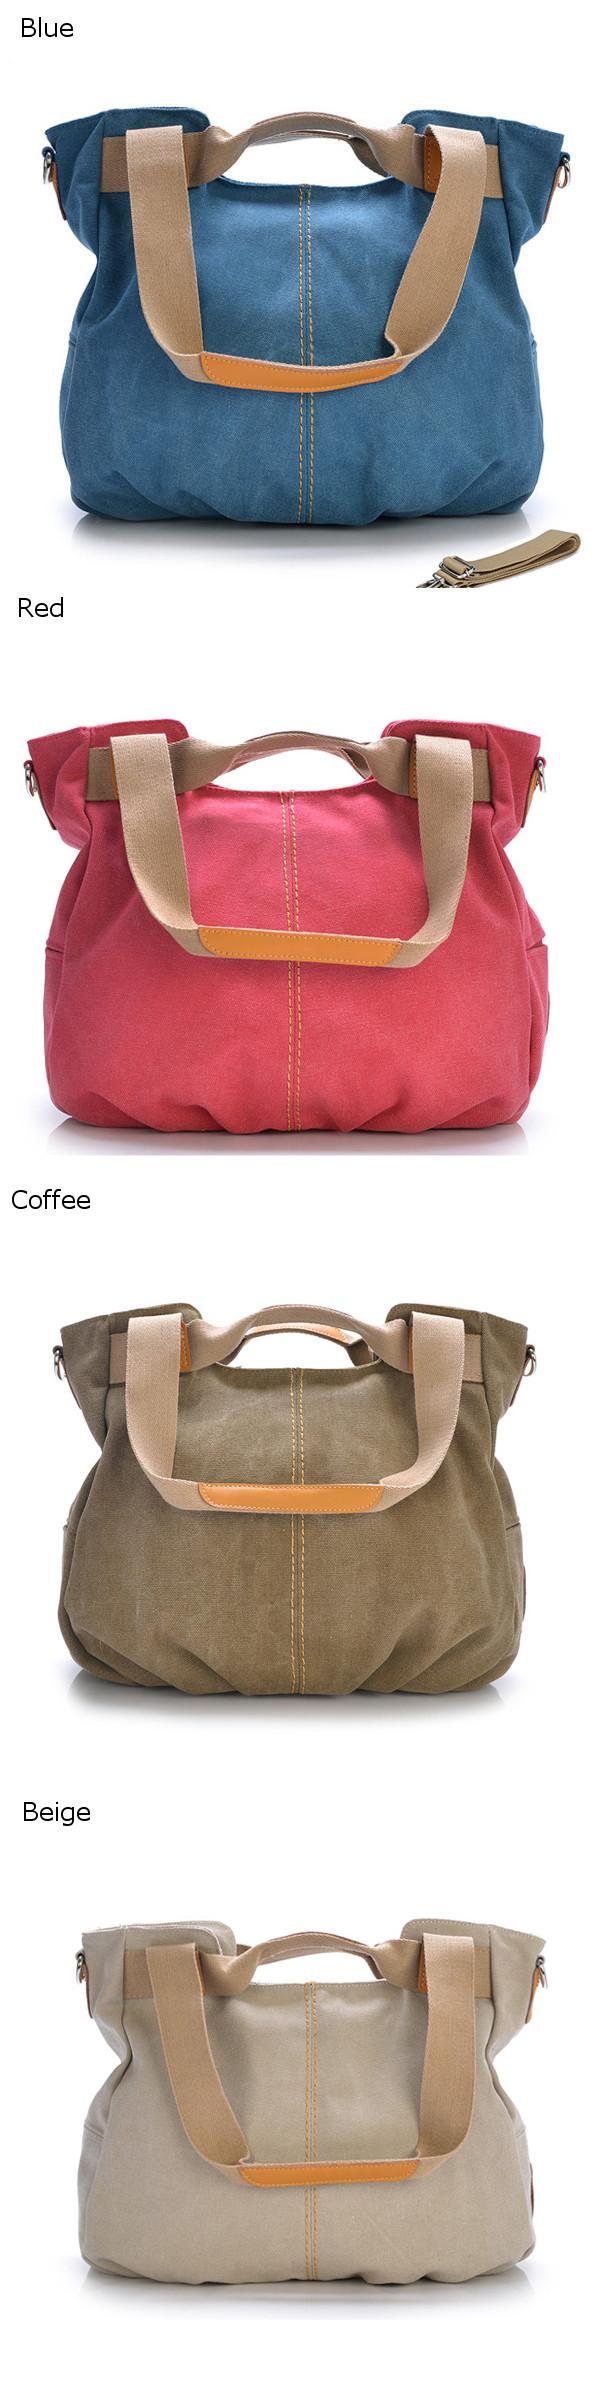 Canvas Casual Women Messenger Bags Vintage Handbag Shoulder Big Bag